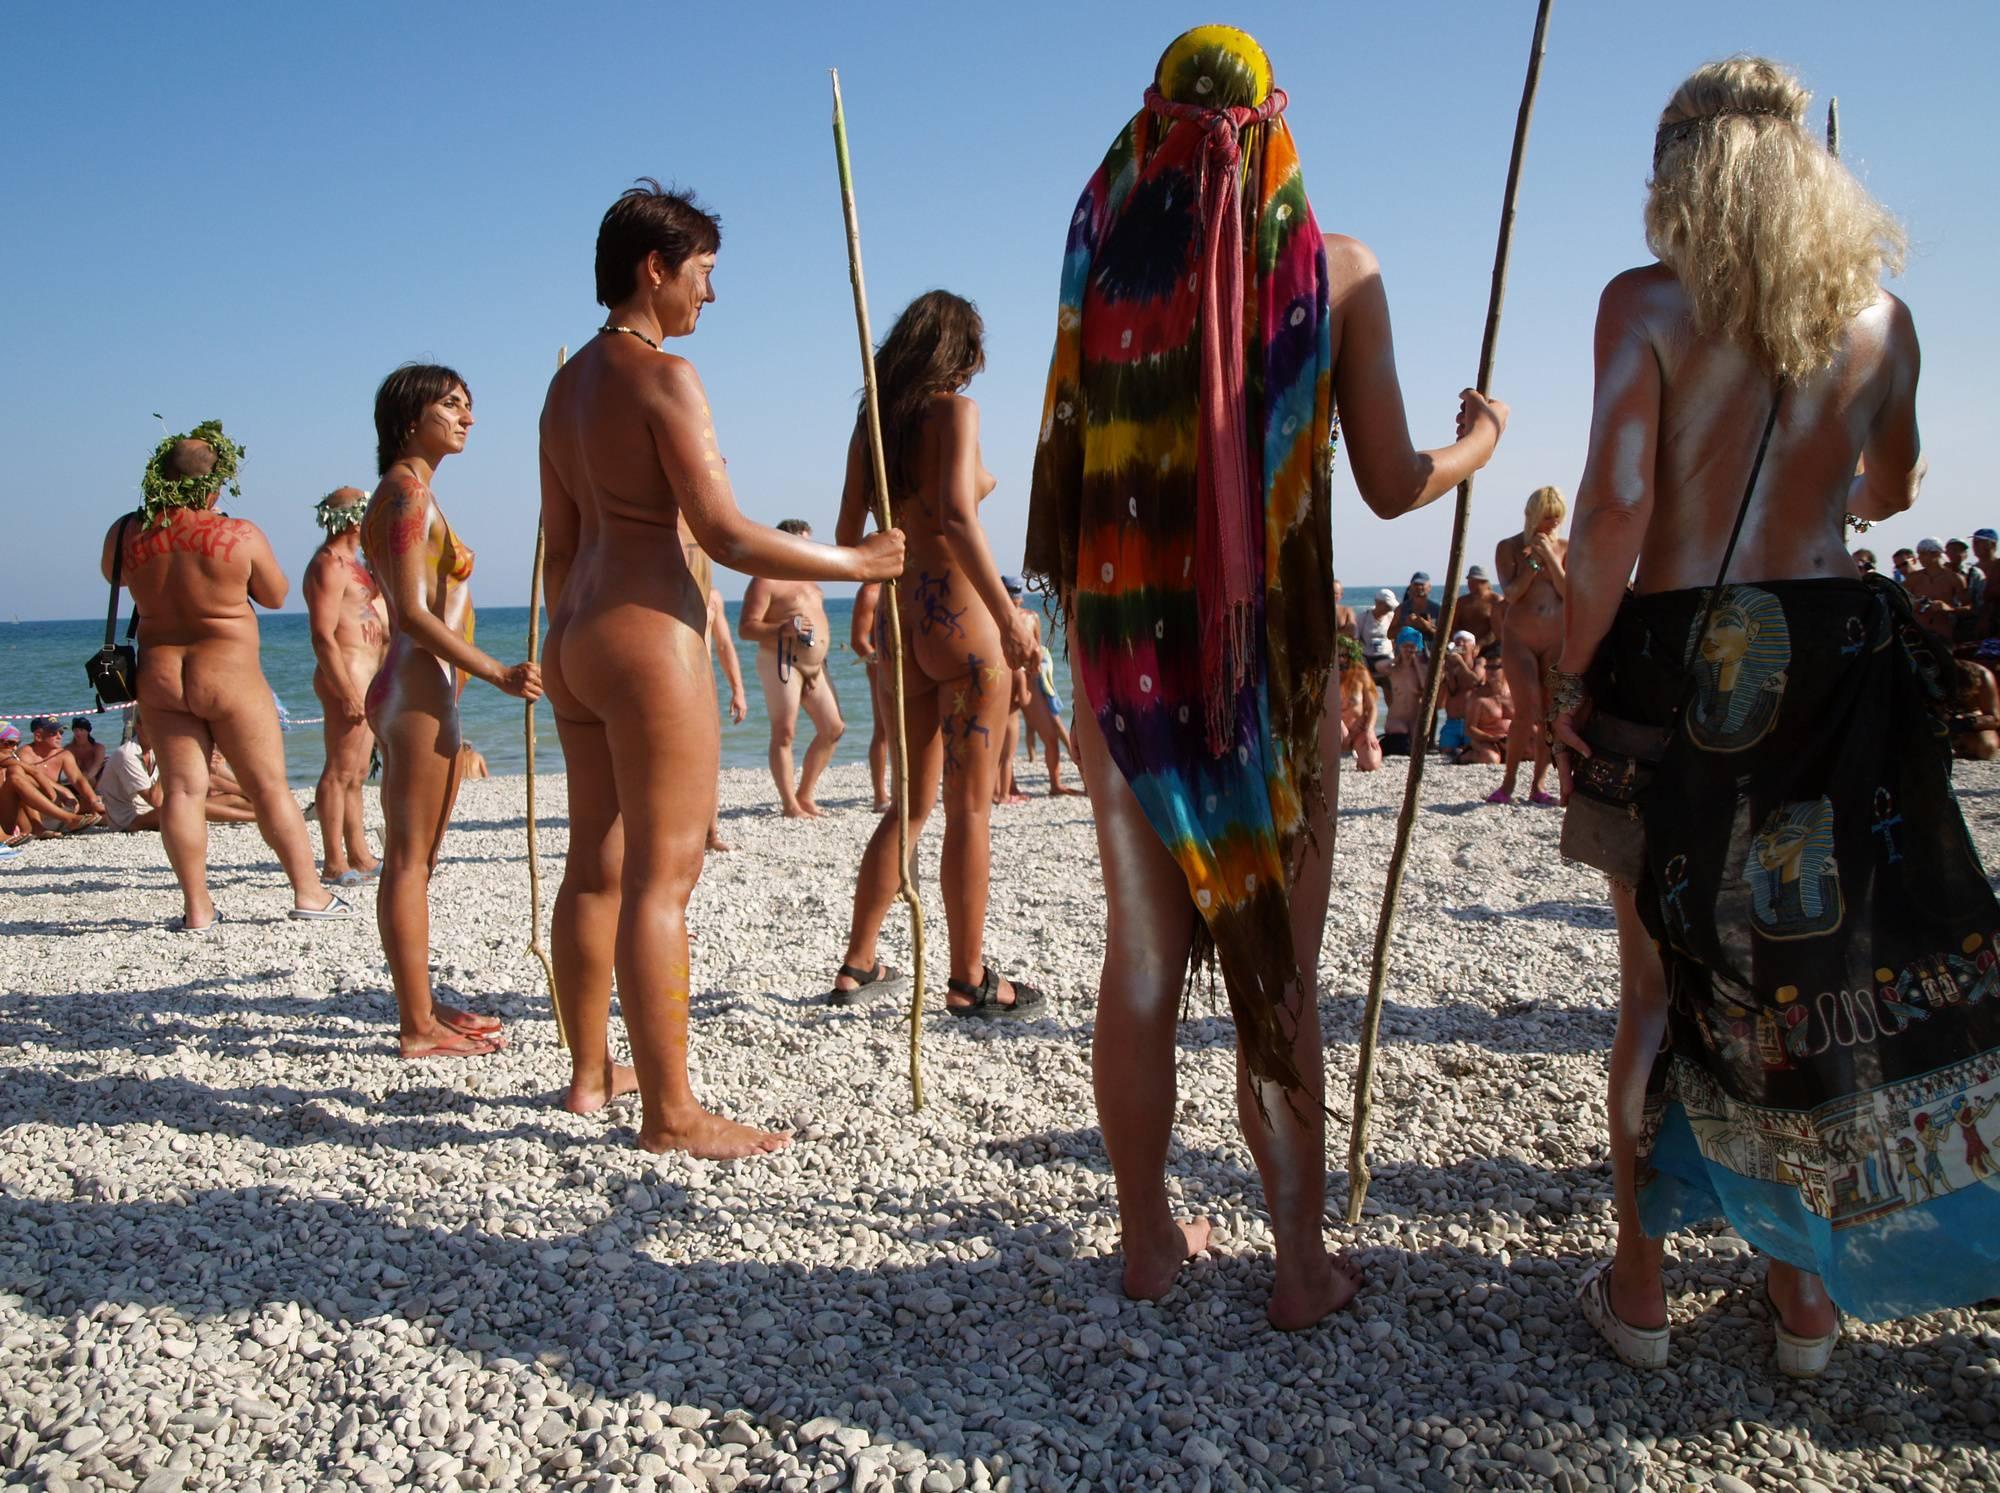 Nudist Photos Nudist Beach Tall Soldiers - 2